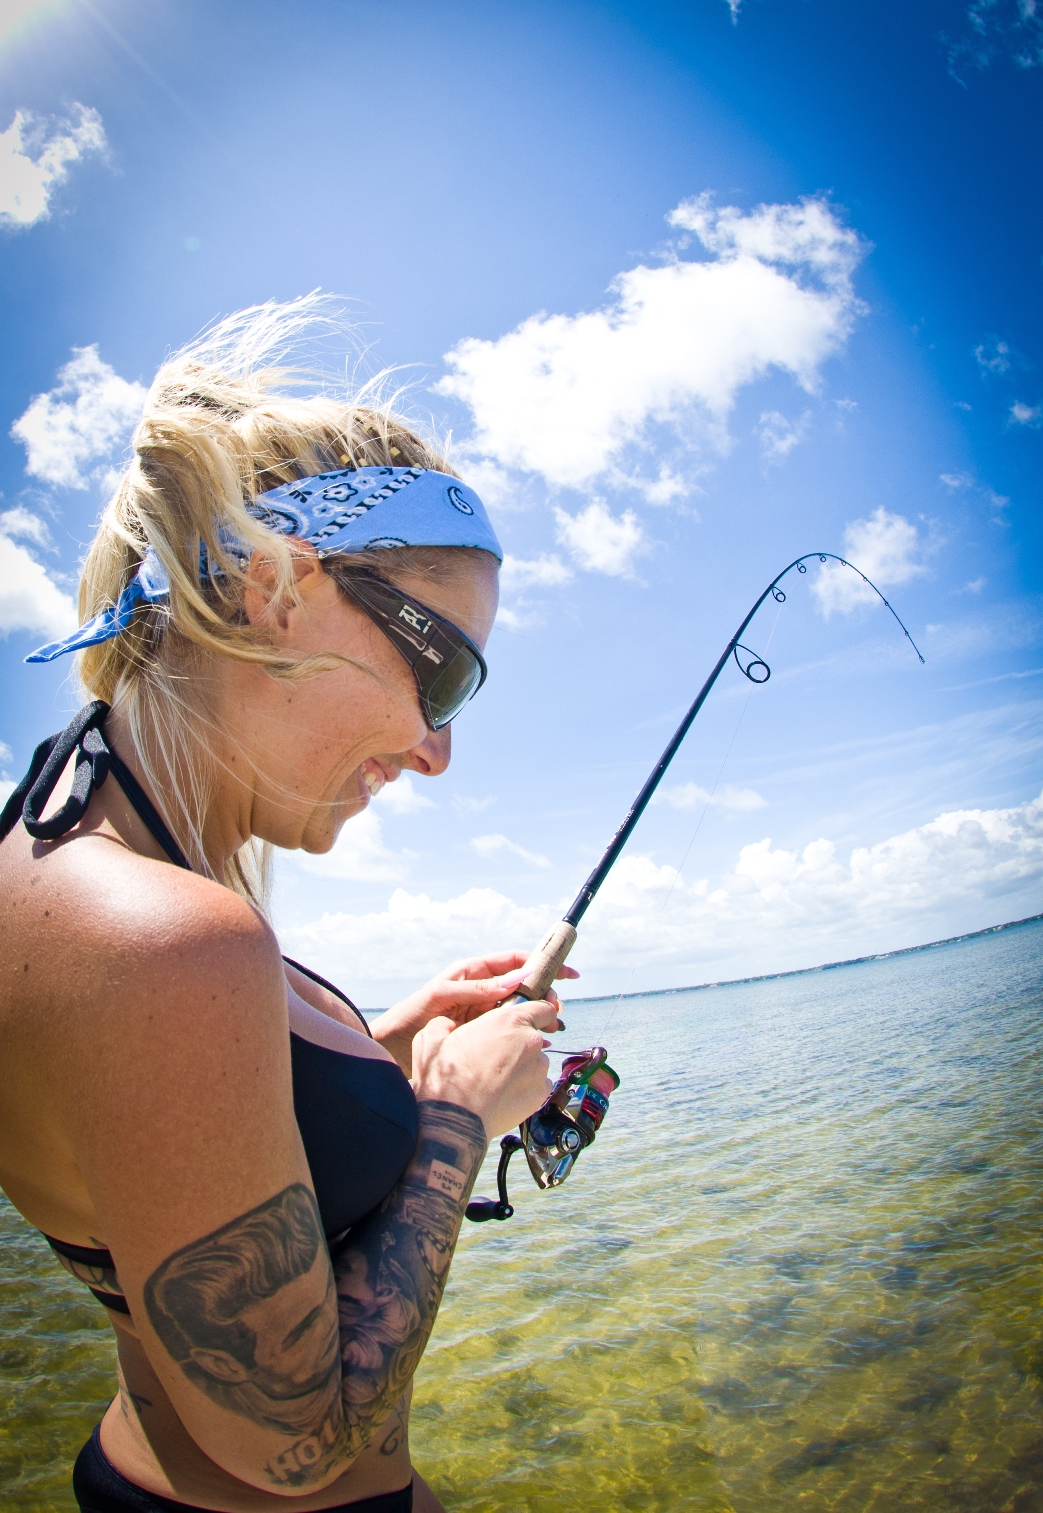 girls who fish